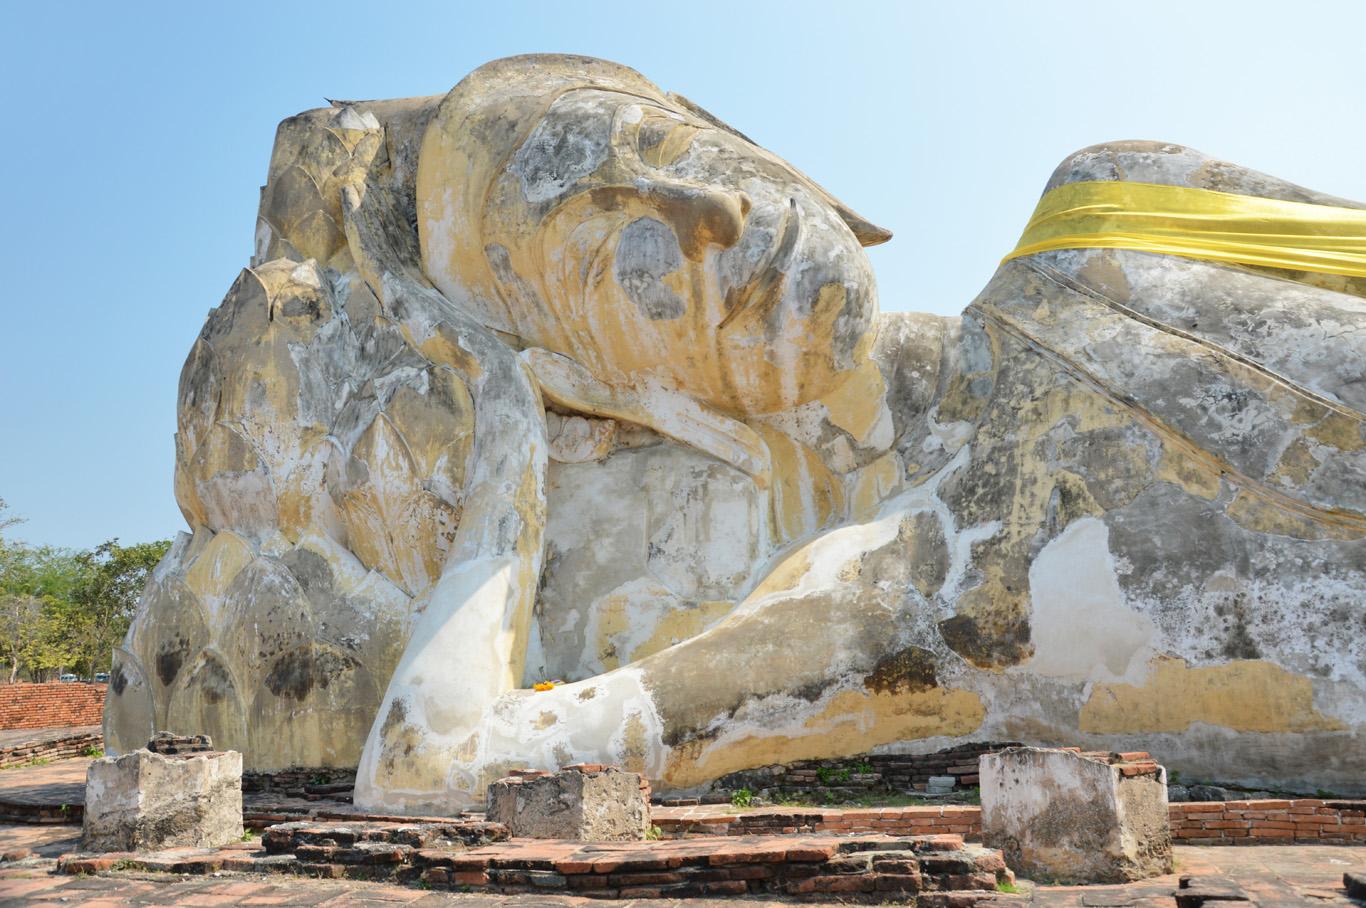 The largest reclining Buddha statue